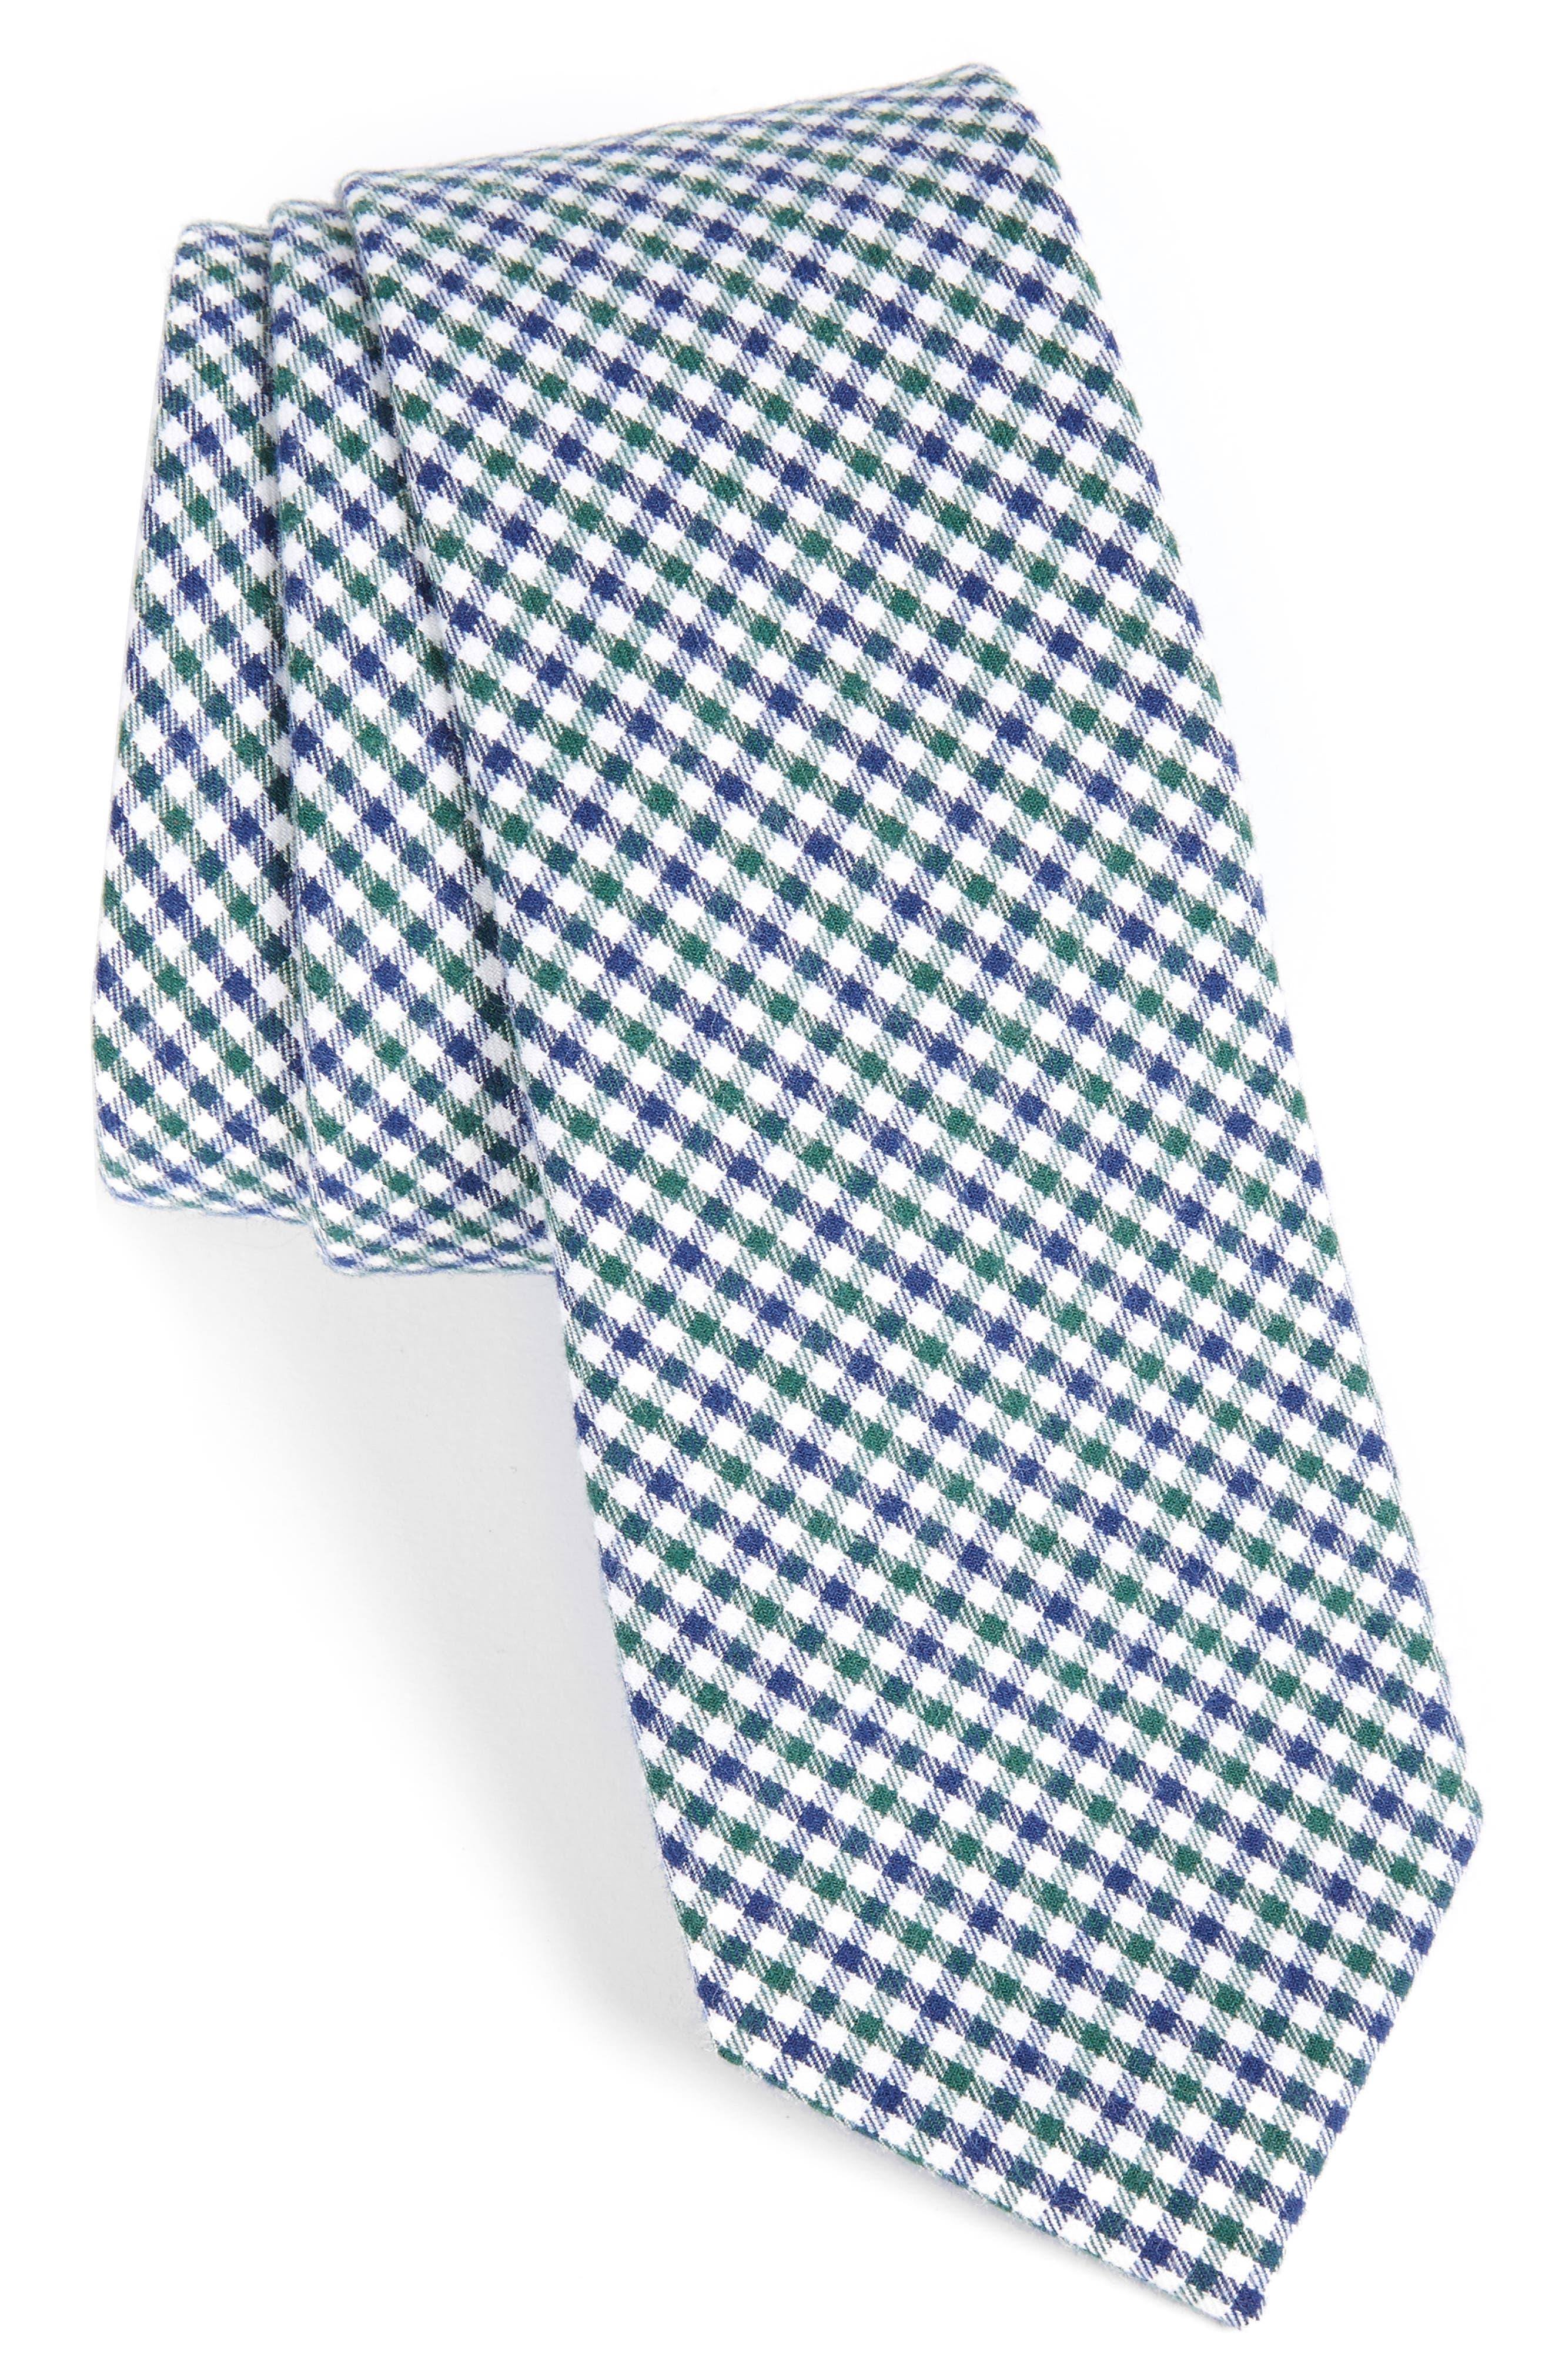 1950s Men's Ties – Vintage, Skinny, Knit, Pattern Neckties Mens 1901 Plaid Cotton Tie $25.00 AT vintagedancer.com